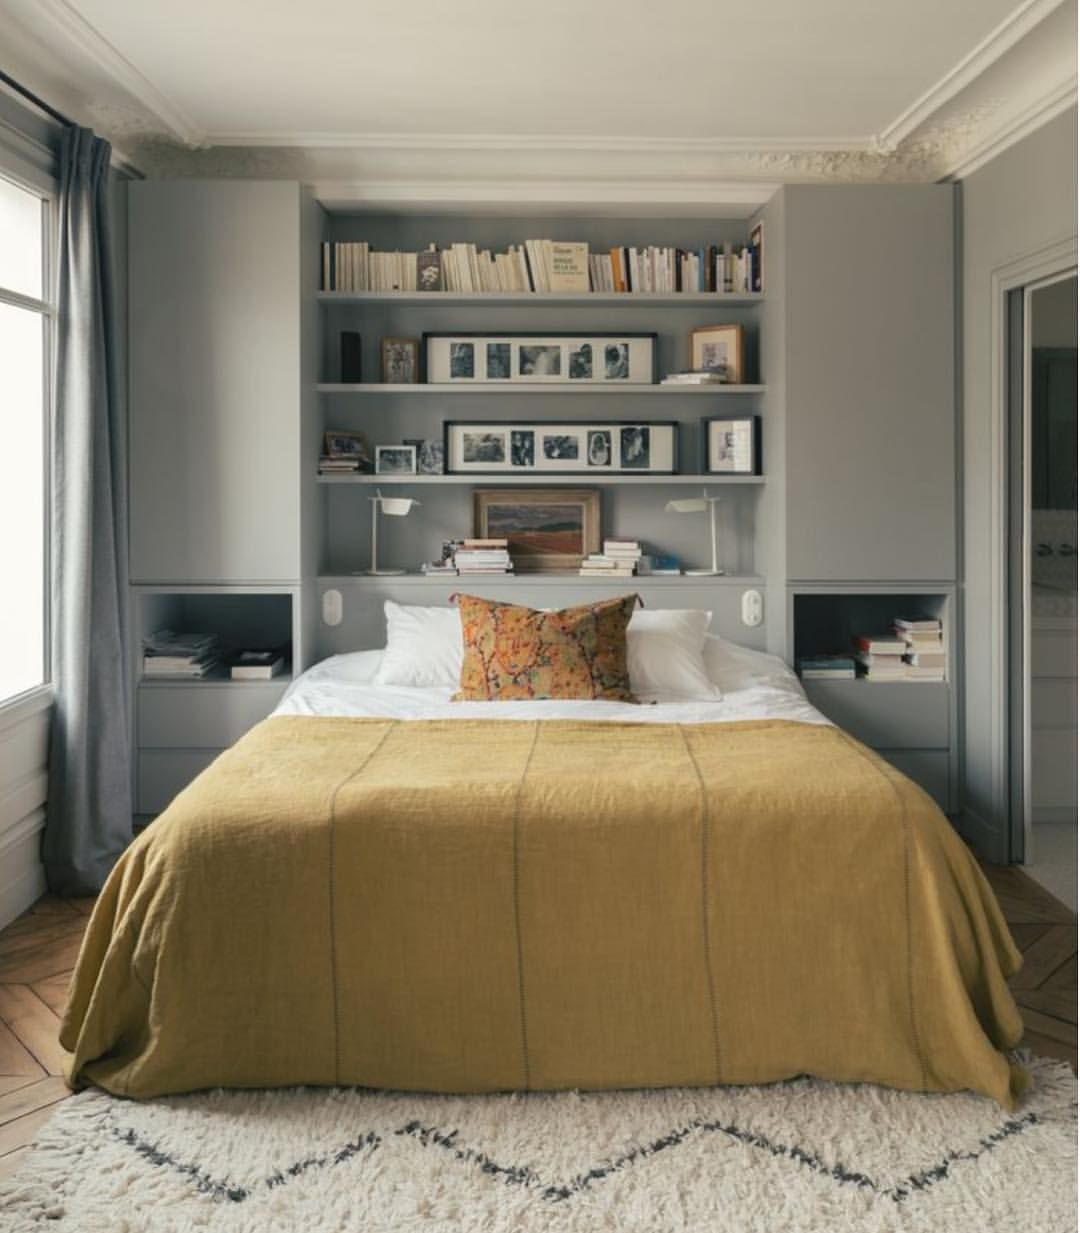 E stay in bed d un lundi d hiver fa on collardmarion - Petite chambre adulte ...